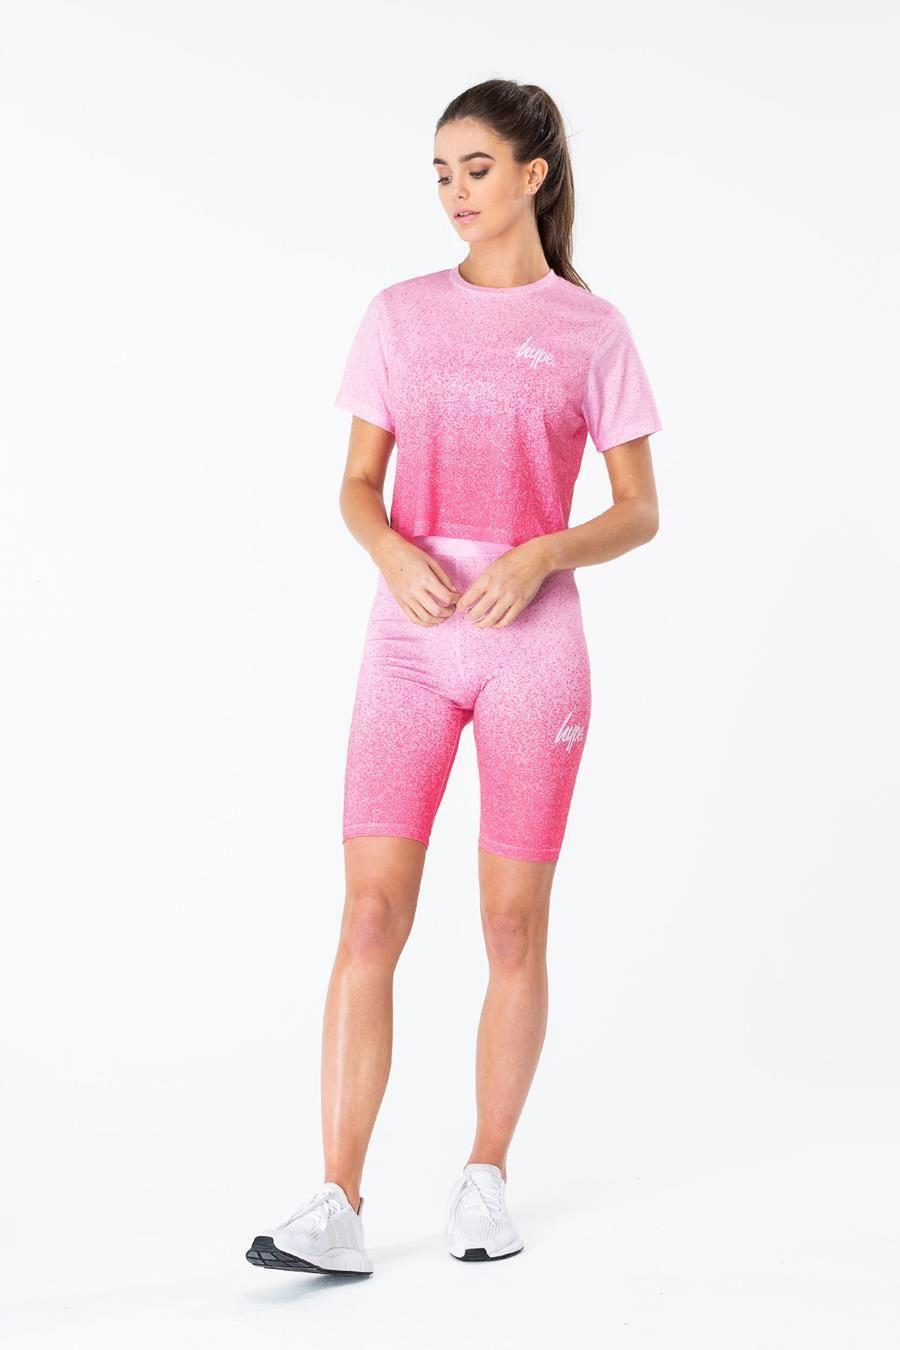 Hype Pink Speckle Fade Womens Crop T-Shirt